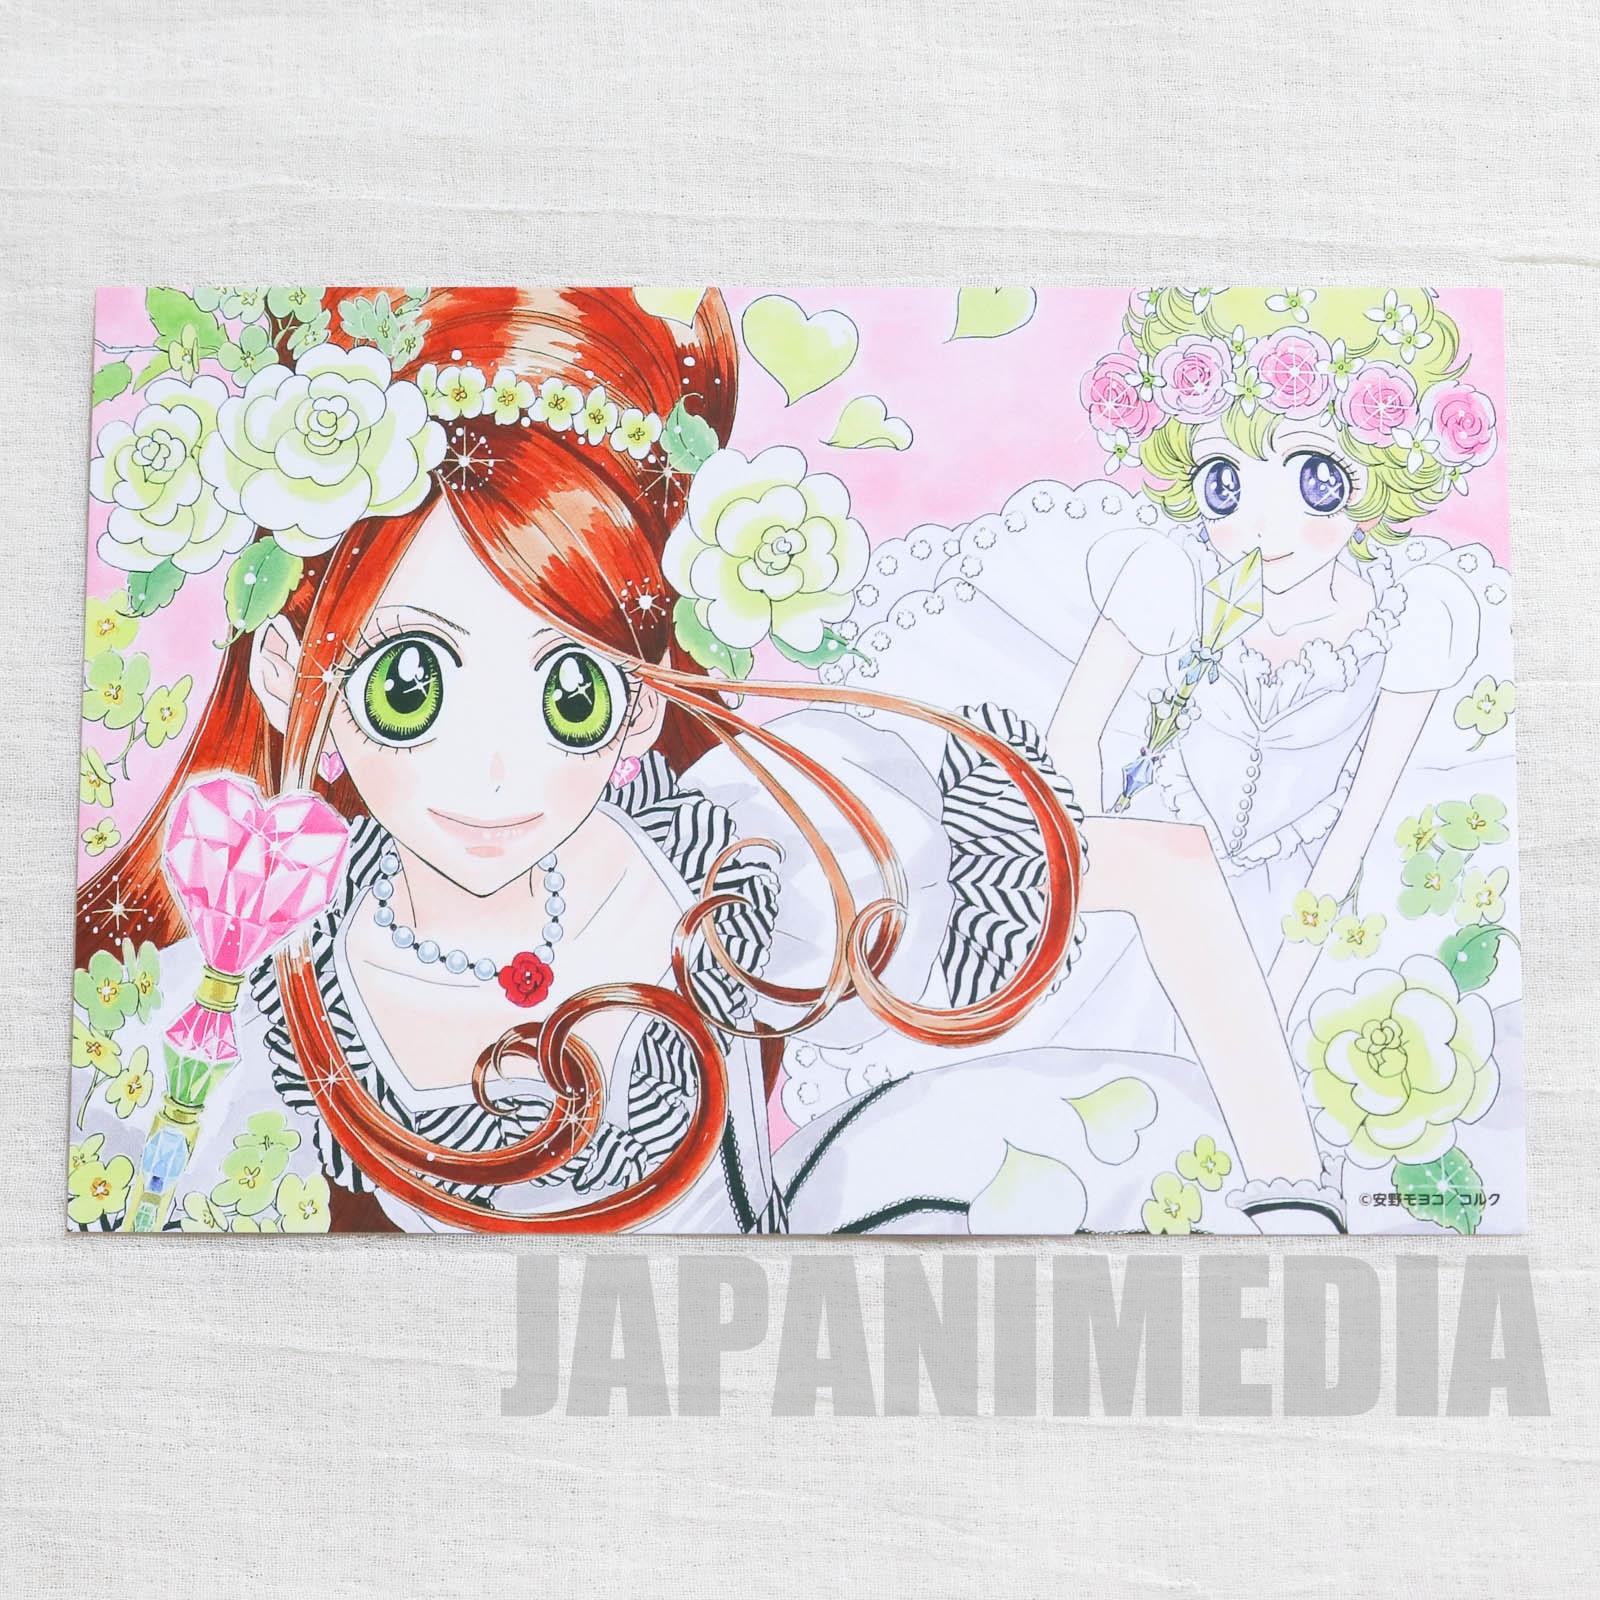 RARE! Sugar Sugar Rune Nakayoshi Post card [Chocola Meilleure | Vanilla Mieux] JAPAN MANGA